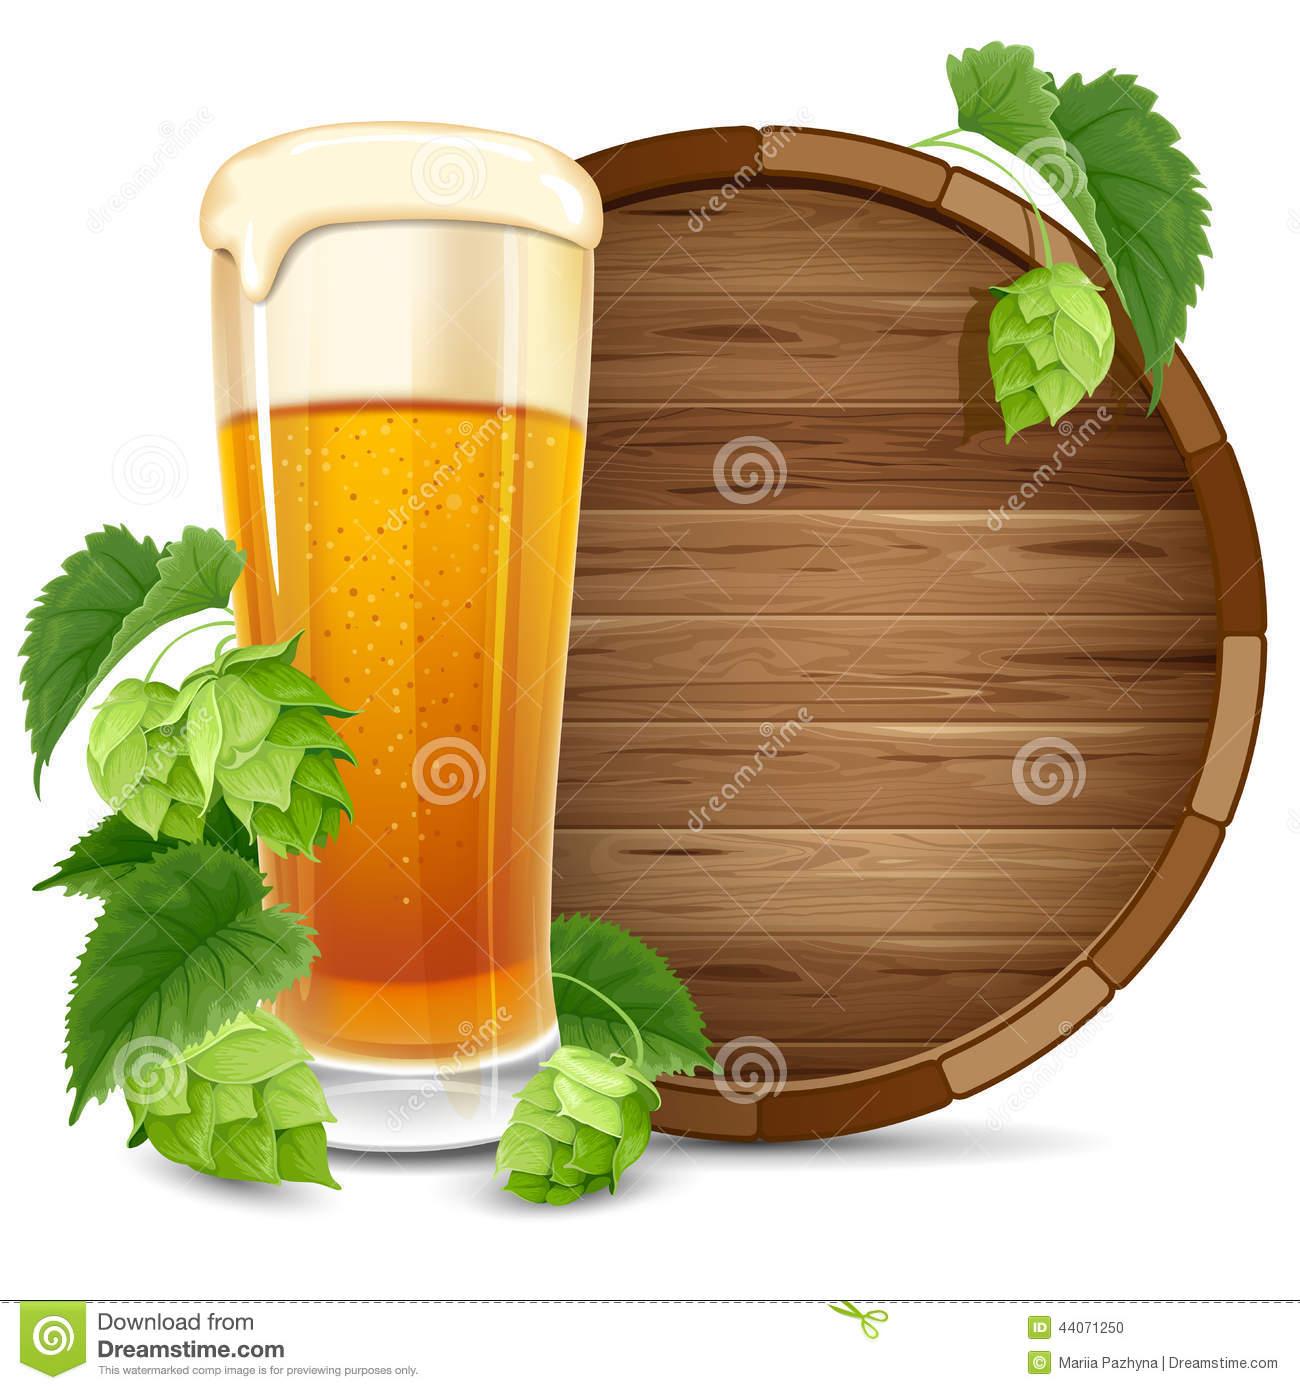 Bier und wein clipart clipart royalty free stock Malz Stock Illustrationen, Vektors, & Klipart – (3,417 Stock ... clipart royalty free stock